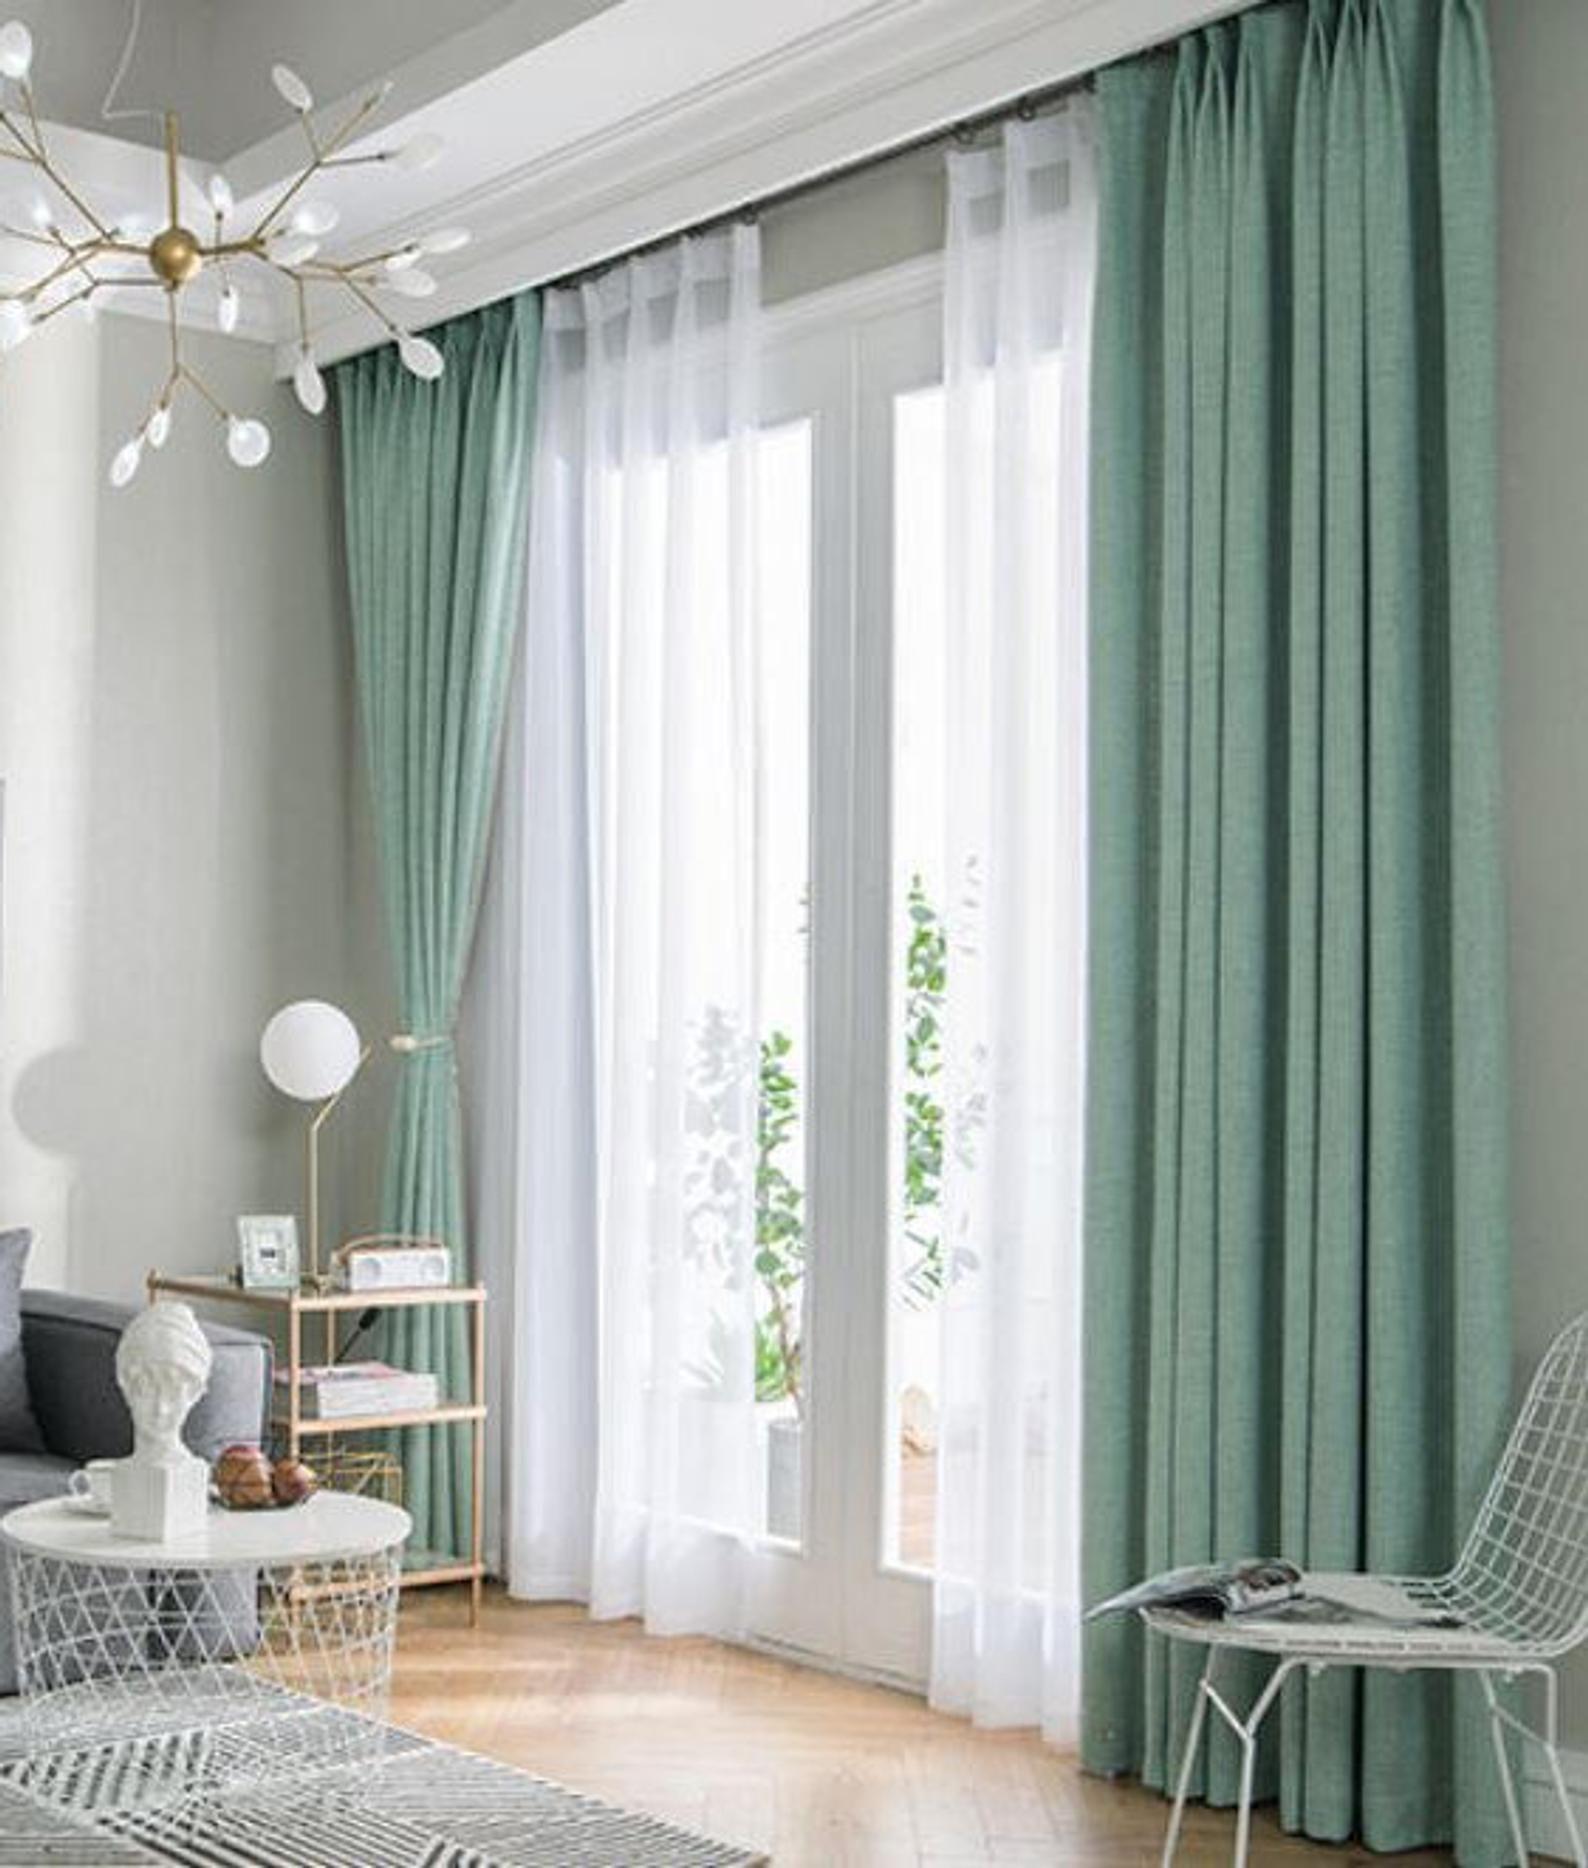 Pair Of Fresh Green Curtains Heavy Weight Curtain Linen Blend Fabric Custom Made Curtains Living Room Decor Curtains Curtains Living Room Modern Curtains Living Room Living room curtains fabric